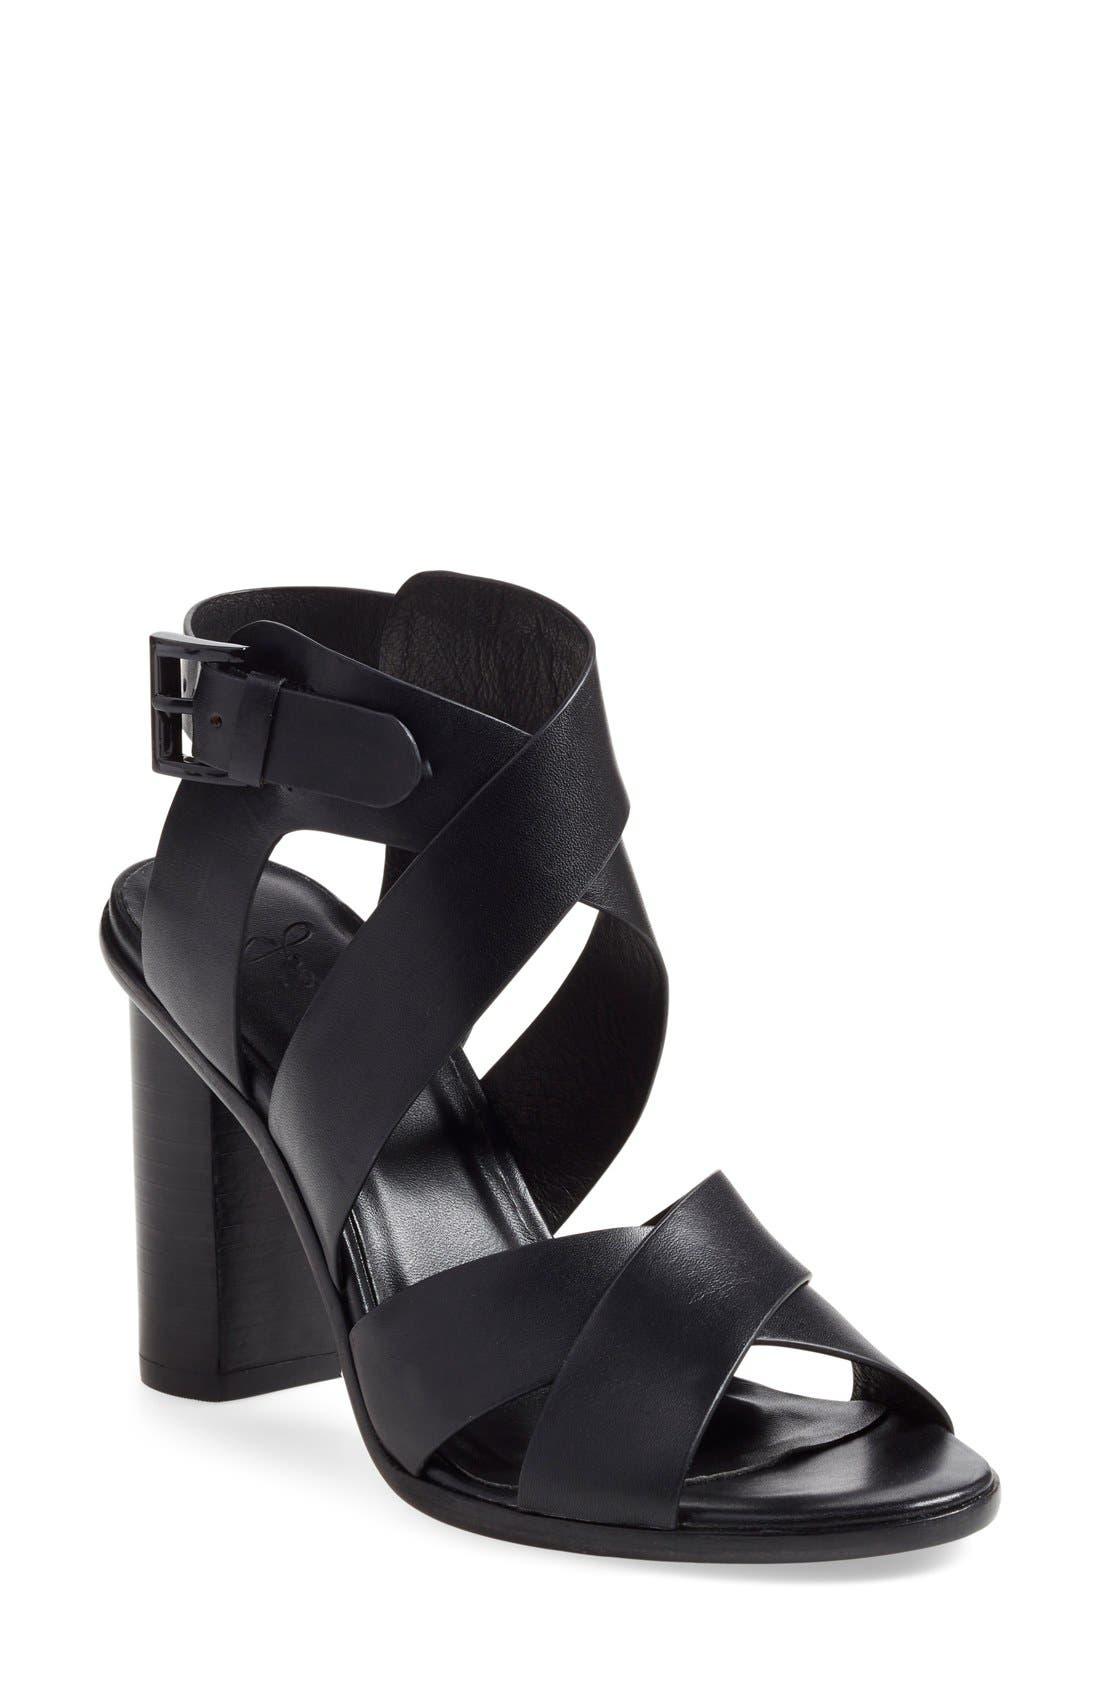 JOIE 'Avery' Crisscross Block Heel Sandal, Main, color, 002